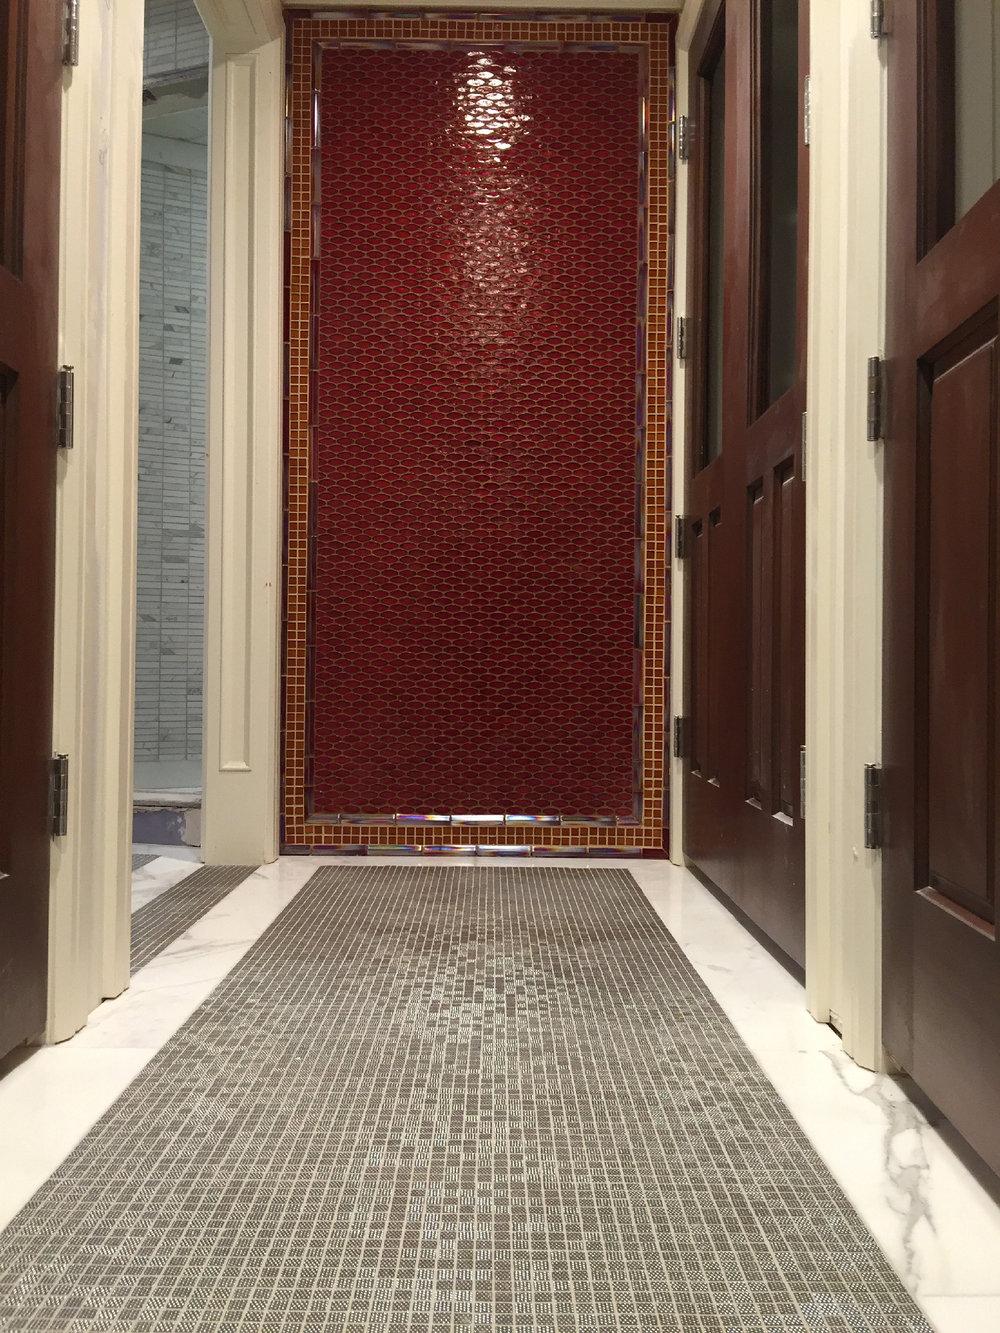 Hallway, Alpine, NJ